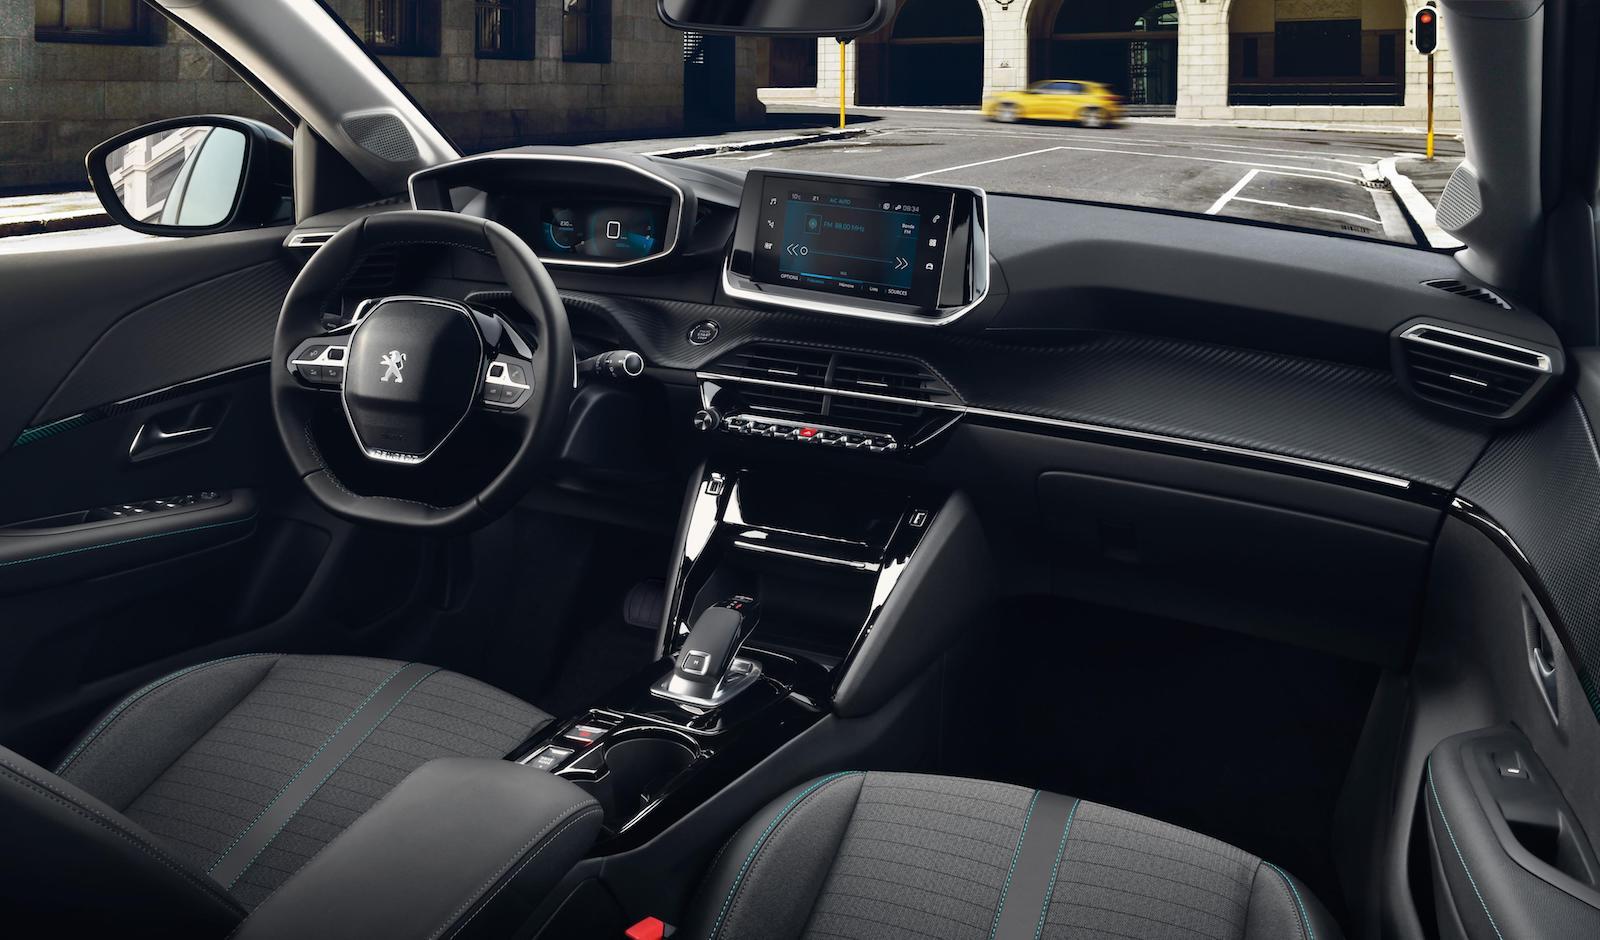 2020 Peugeot 208 Revealed, Debuts E-CMP Architecture